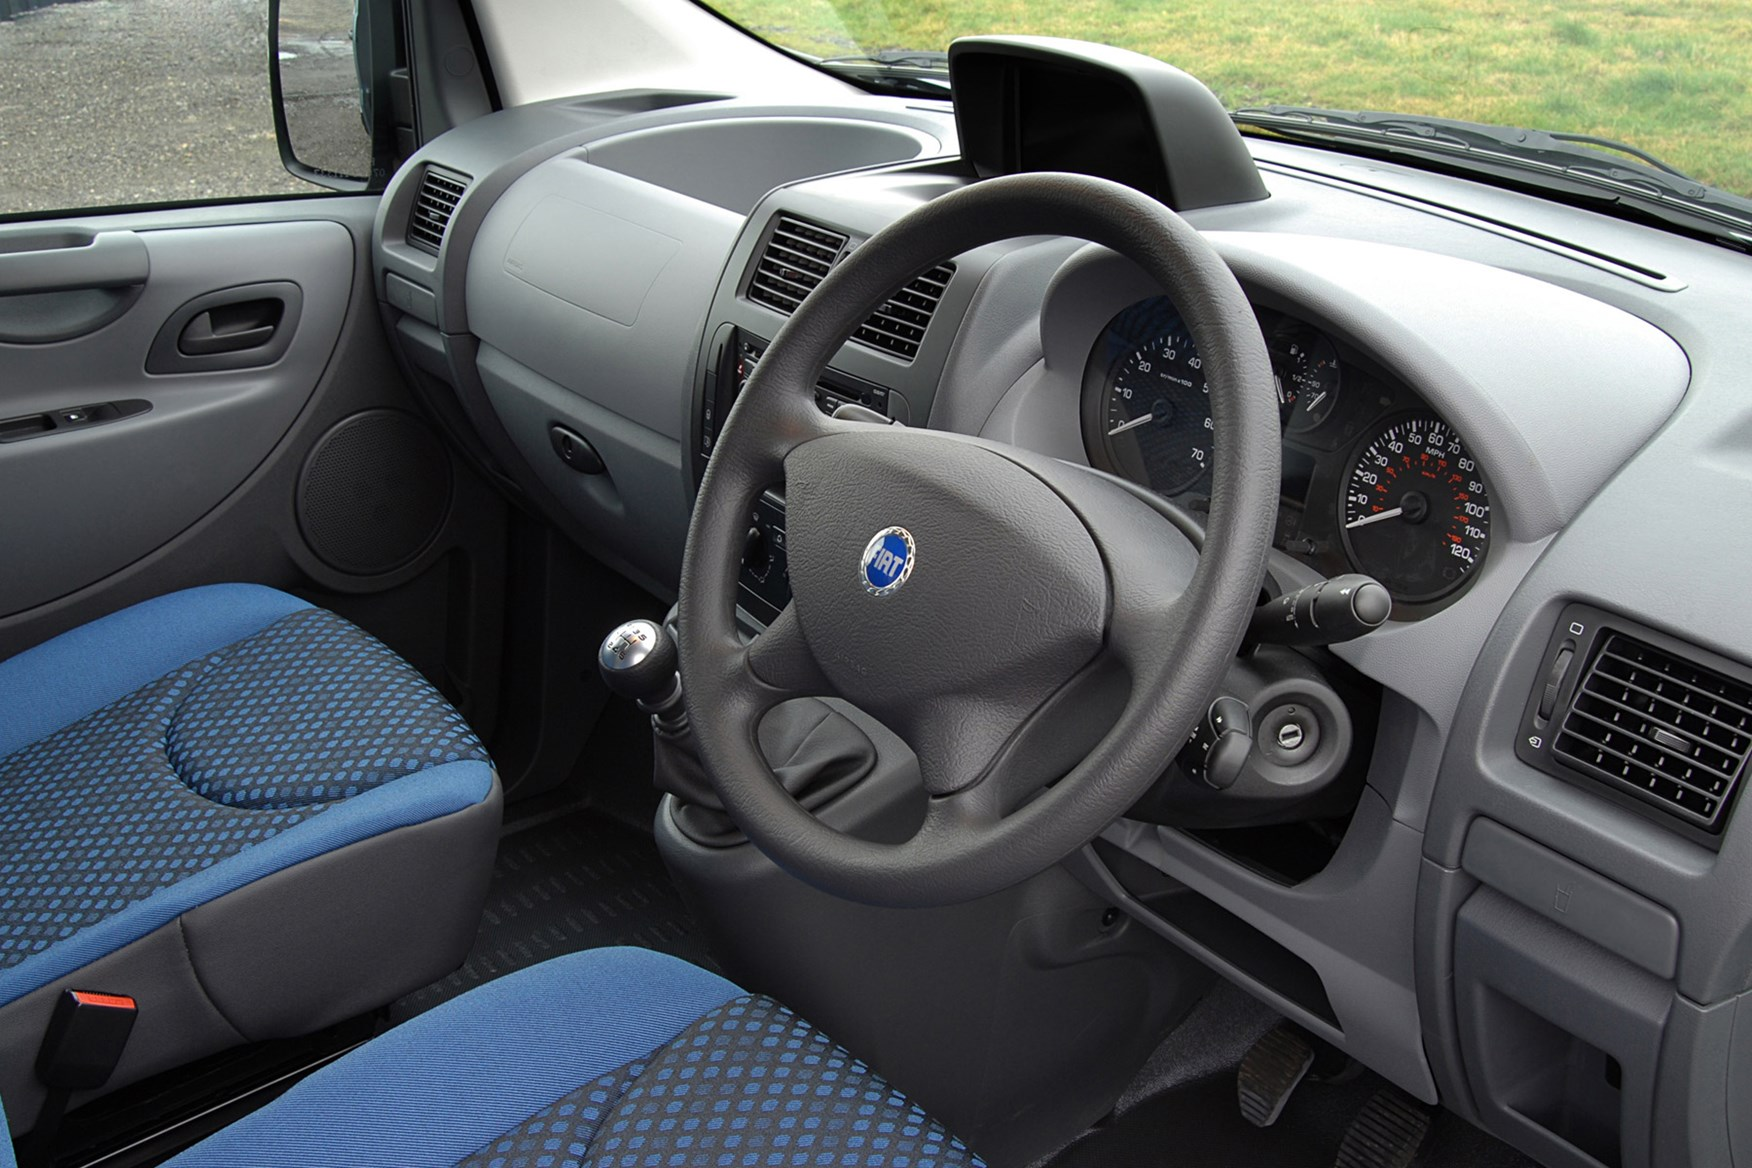 Fiat Scudo 2007-2016 review on Parkers Vans - interior